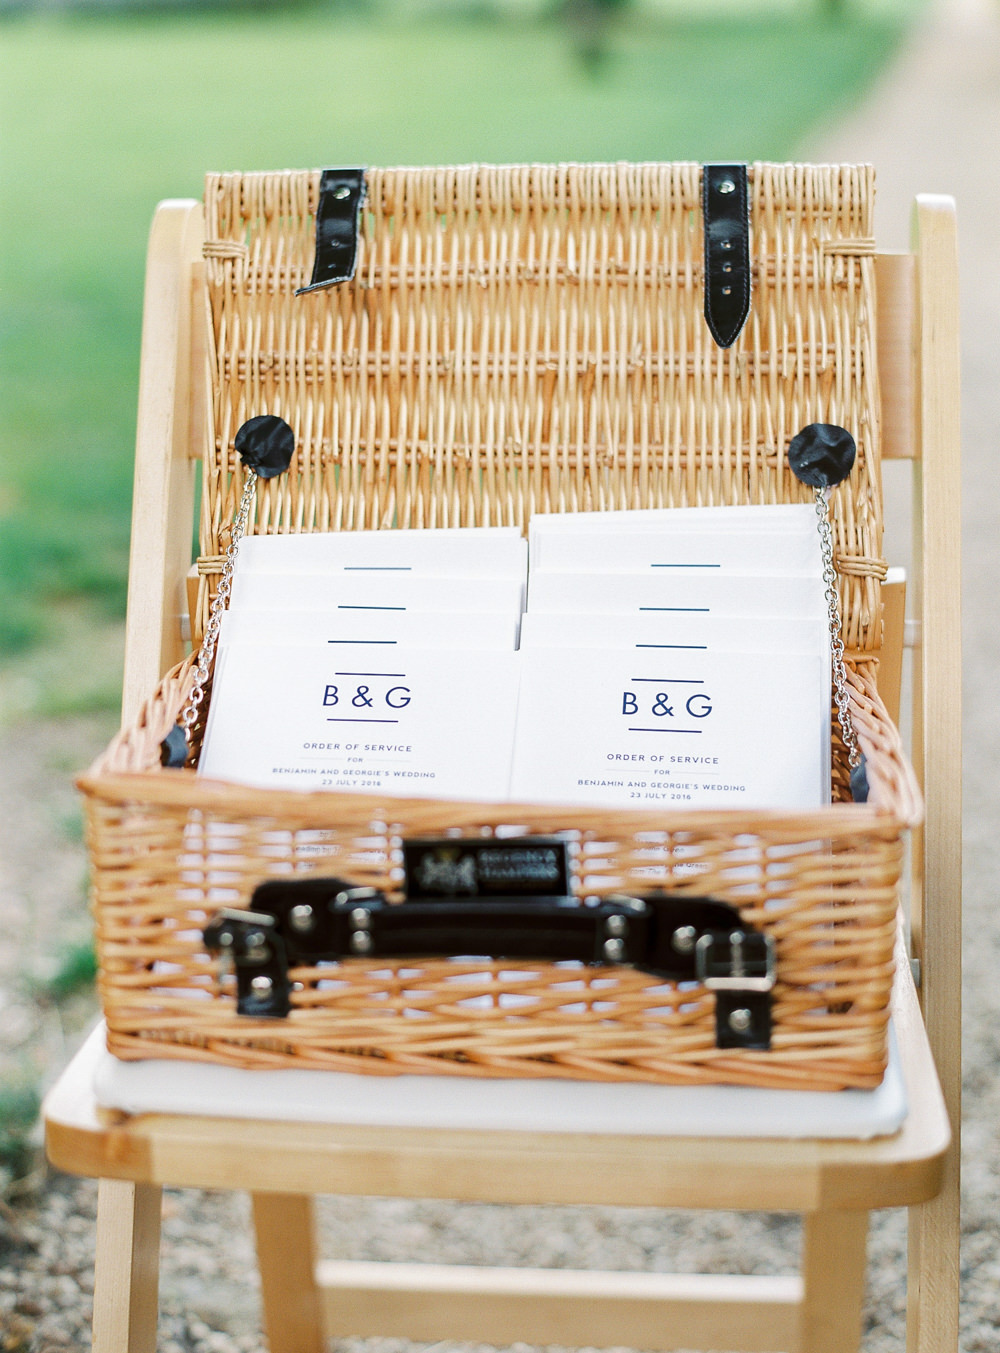 Order of service in picnic basket